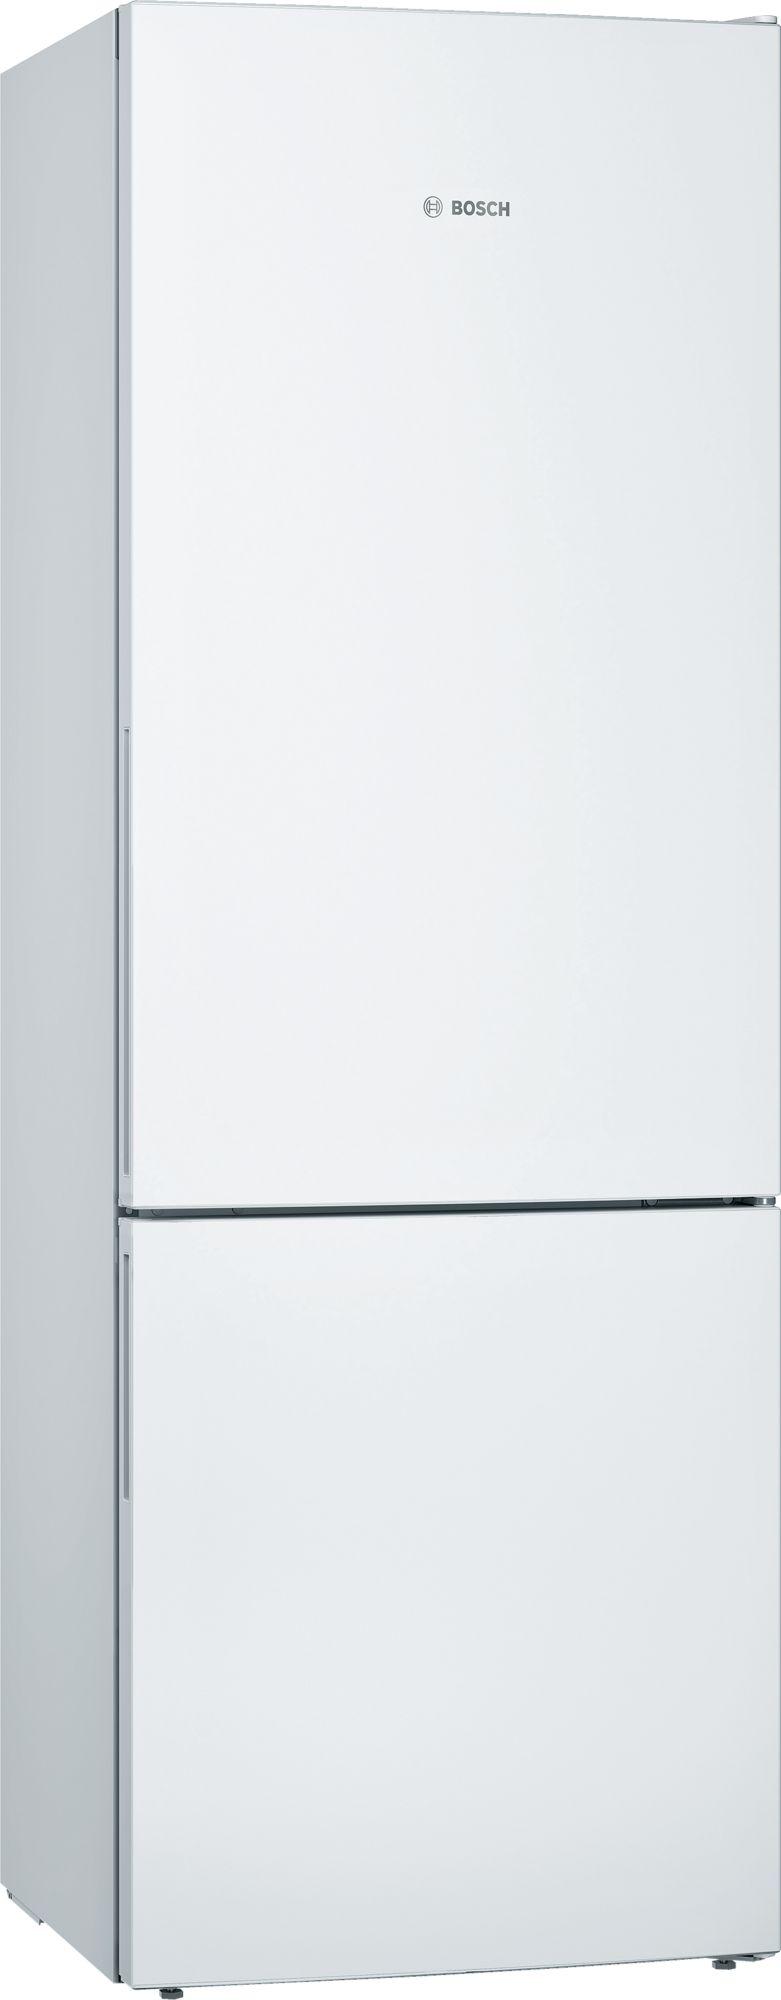 Bosch KGE49VW4AG Low Frost 60/40 Freestanding Fridge Freezer White